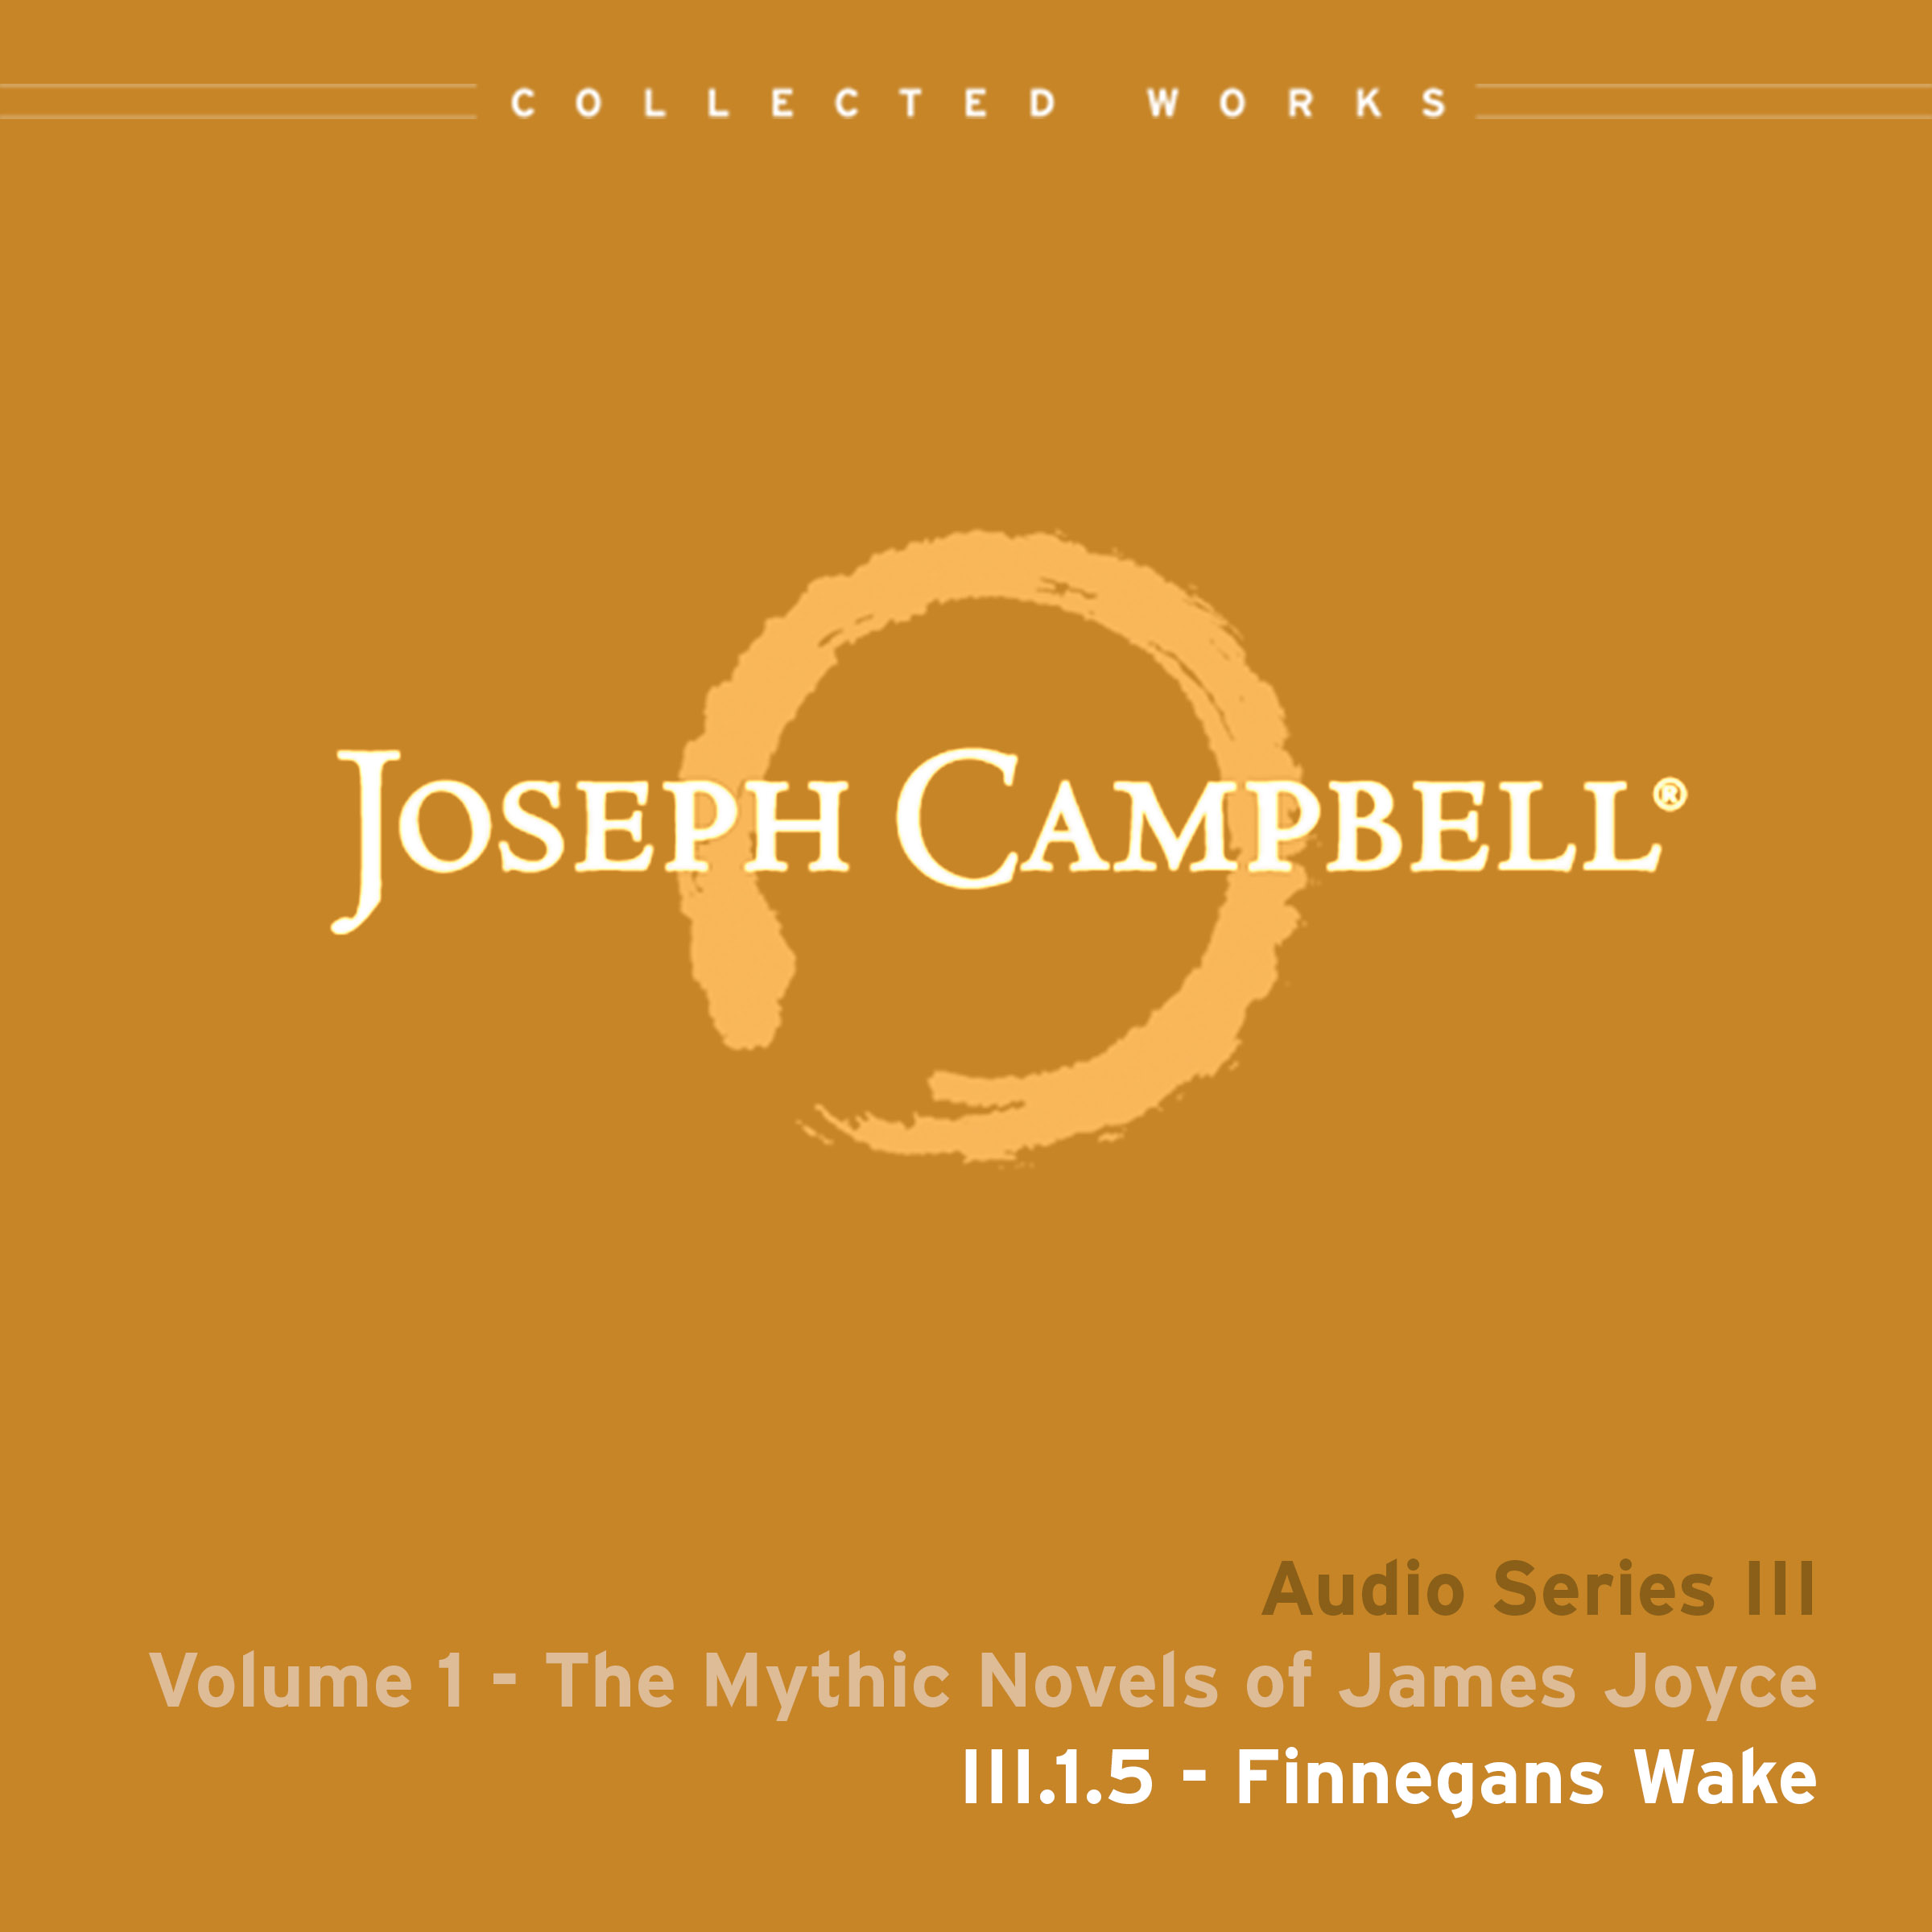 Finnegans Wake (Audio: Lecture III.1.5)